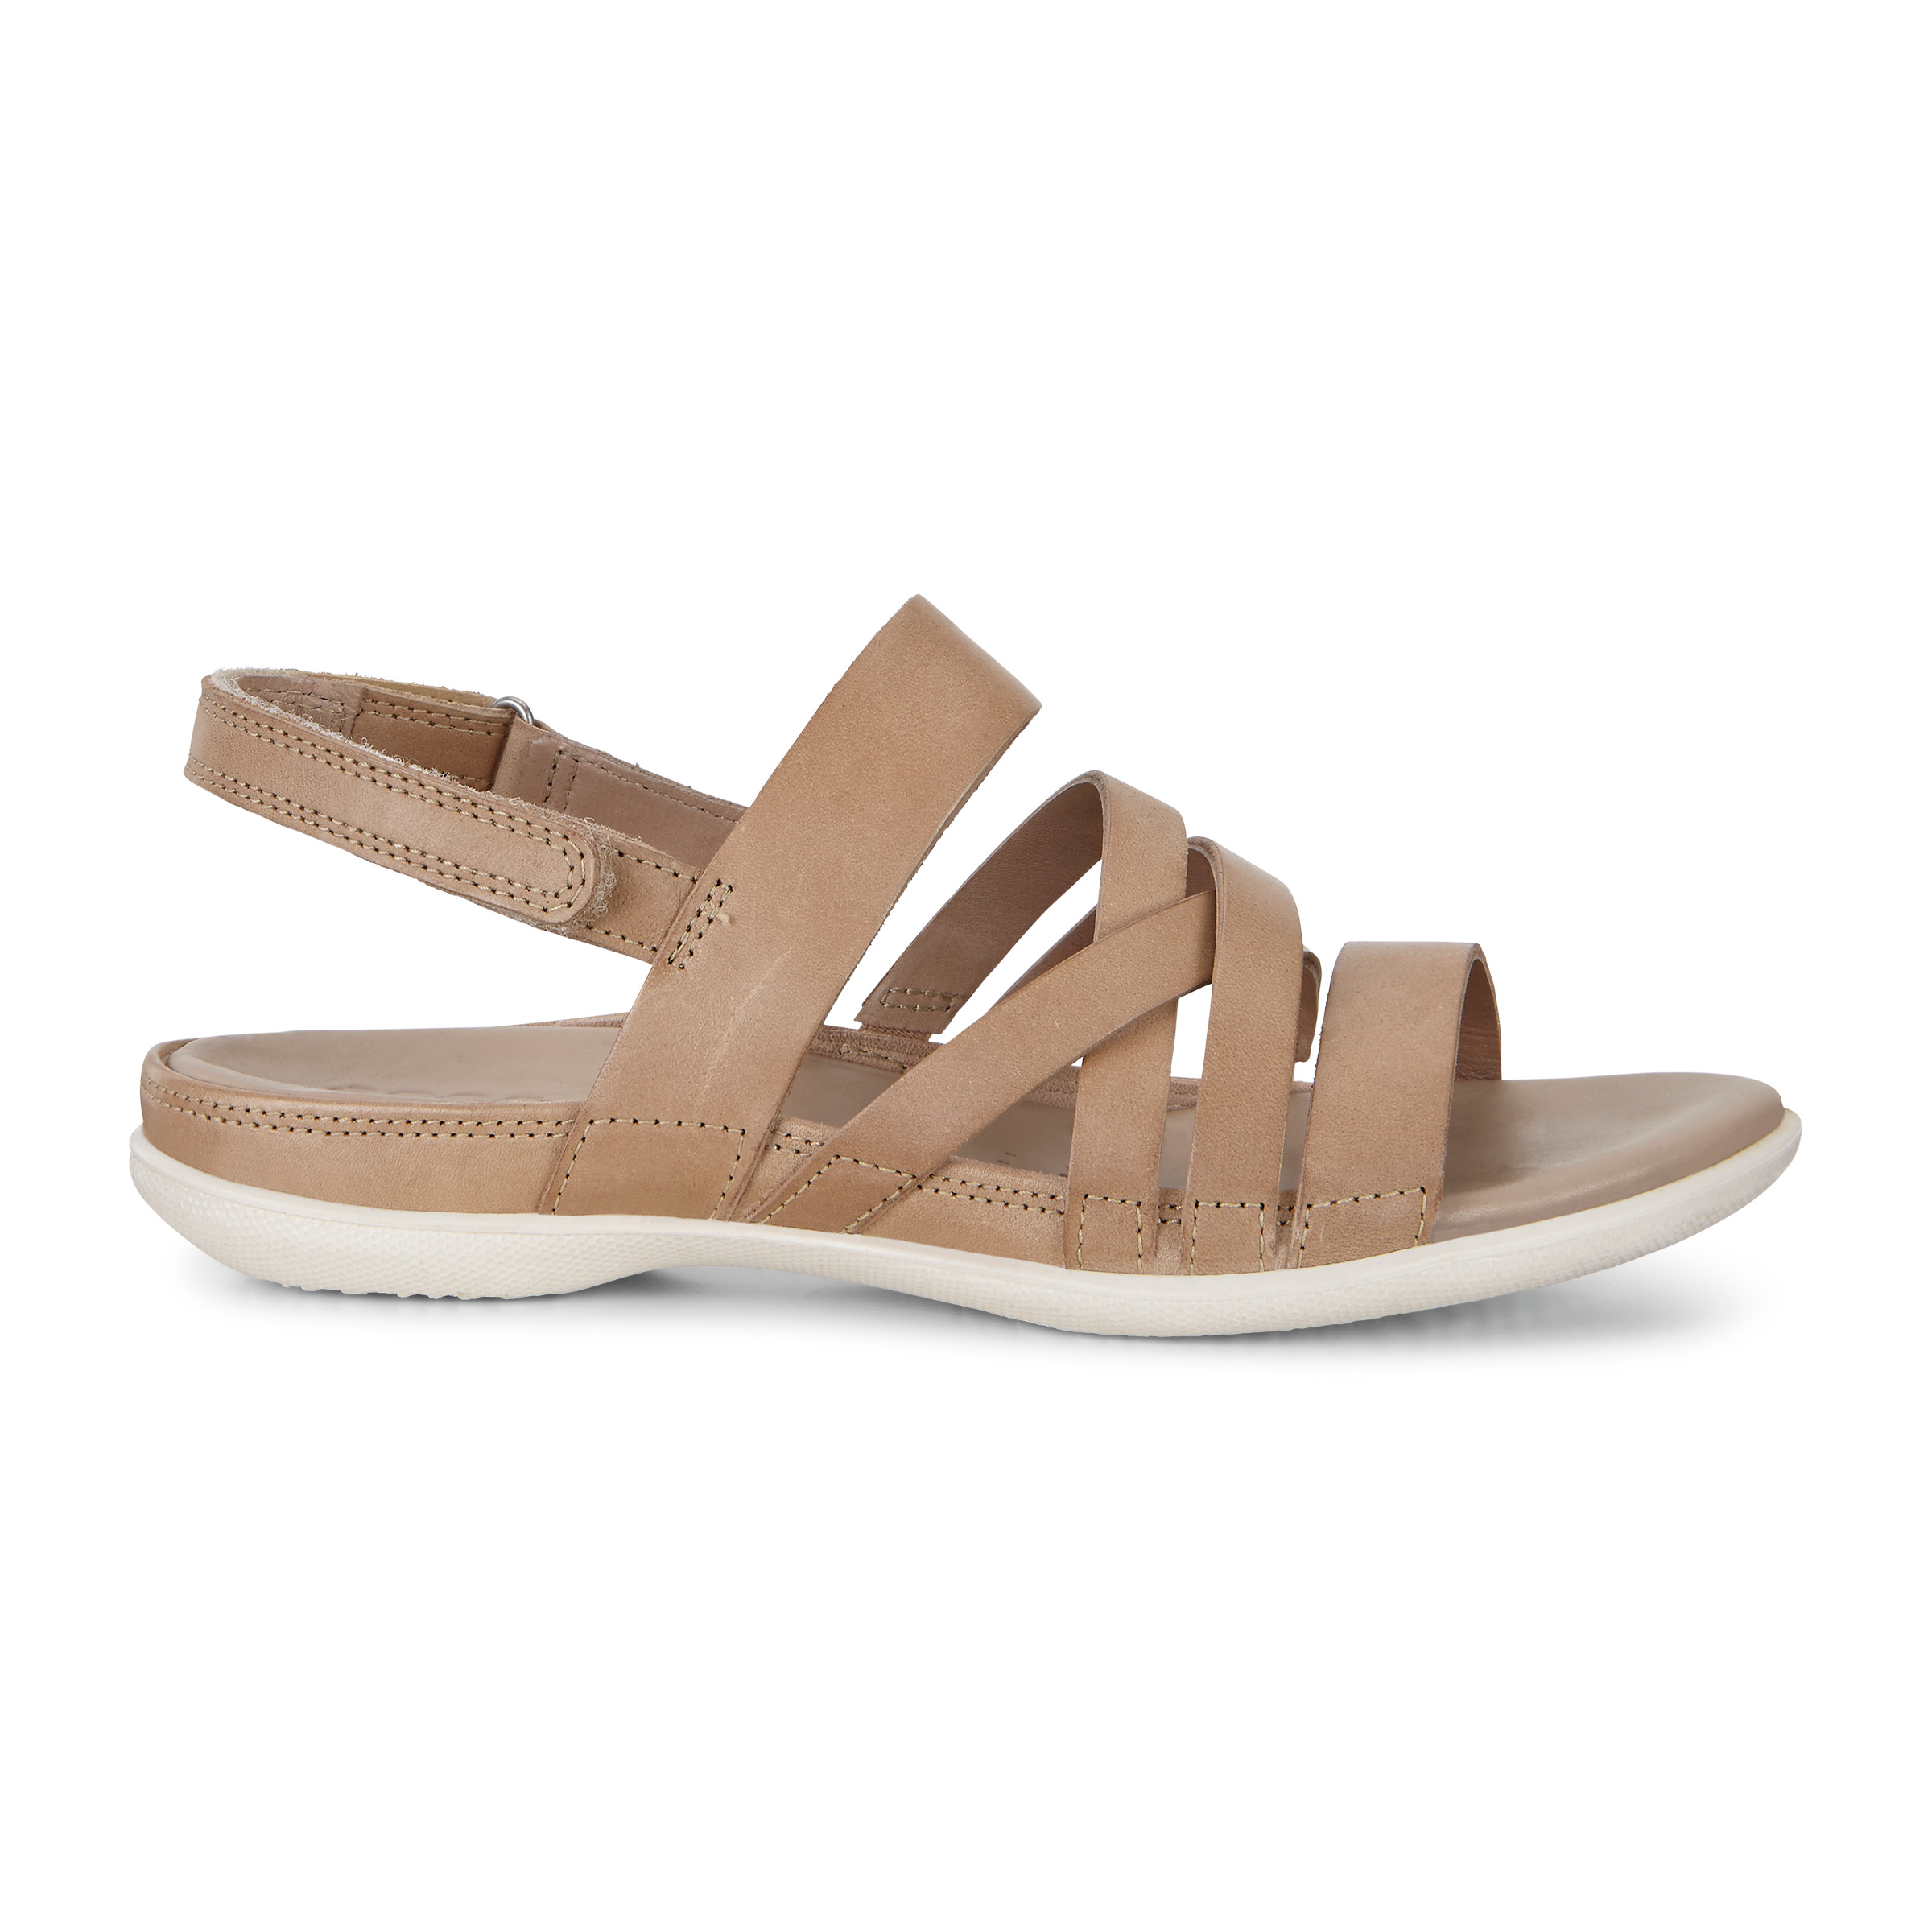 ECCO Flash Casual Sandal Size 6-6.5 Dune